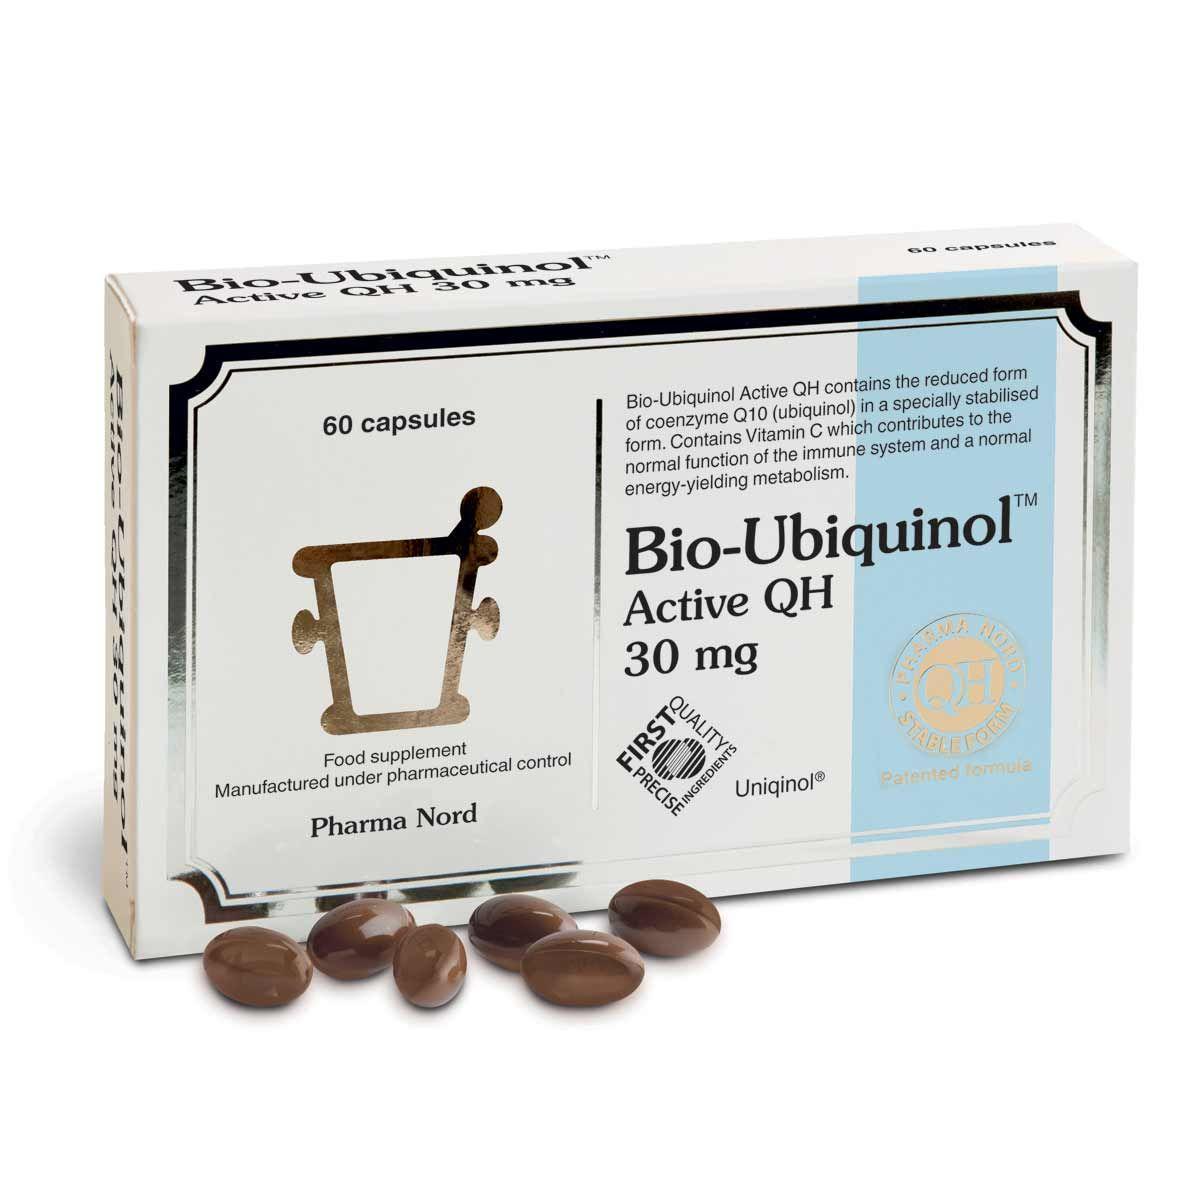 Bio-Ubiquinol Active QH 30mg 60's